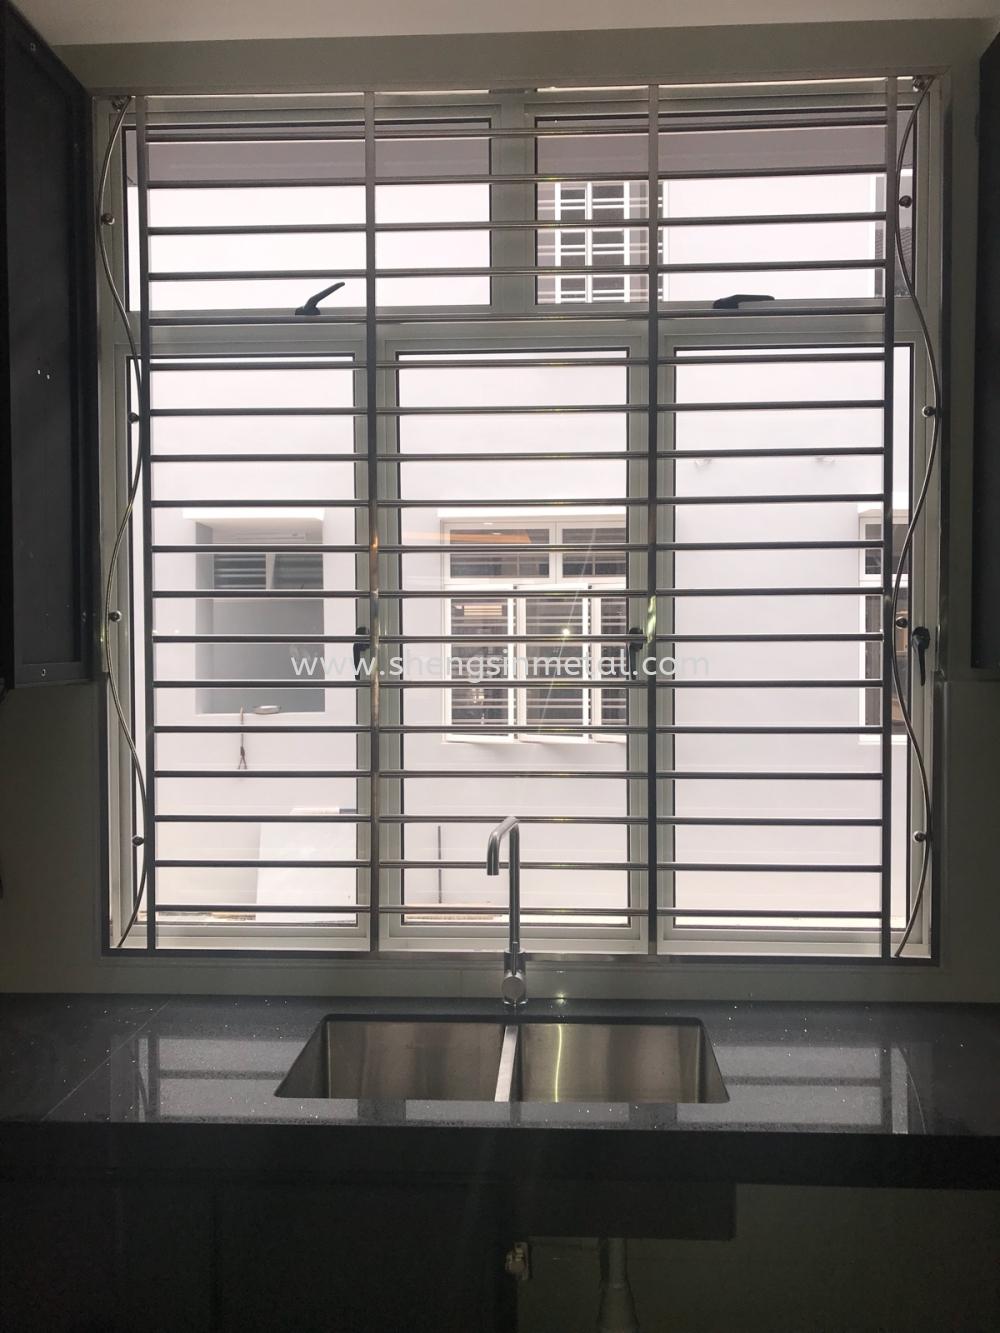 Window Stainless Steel Johor Bahru, JB, Skudai, 仟表 Design, Installation, Supply | Sheng Sin Metal Work & Enterprise